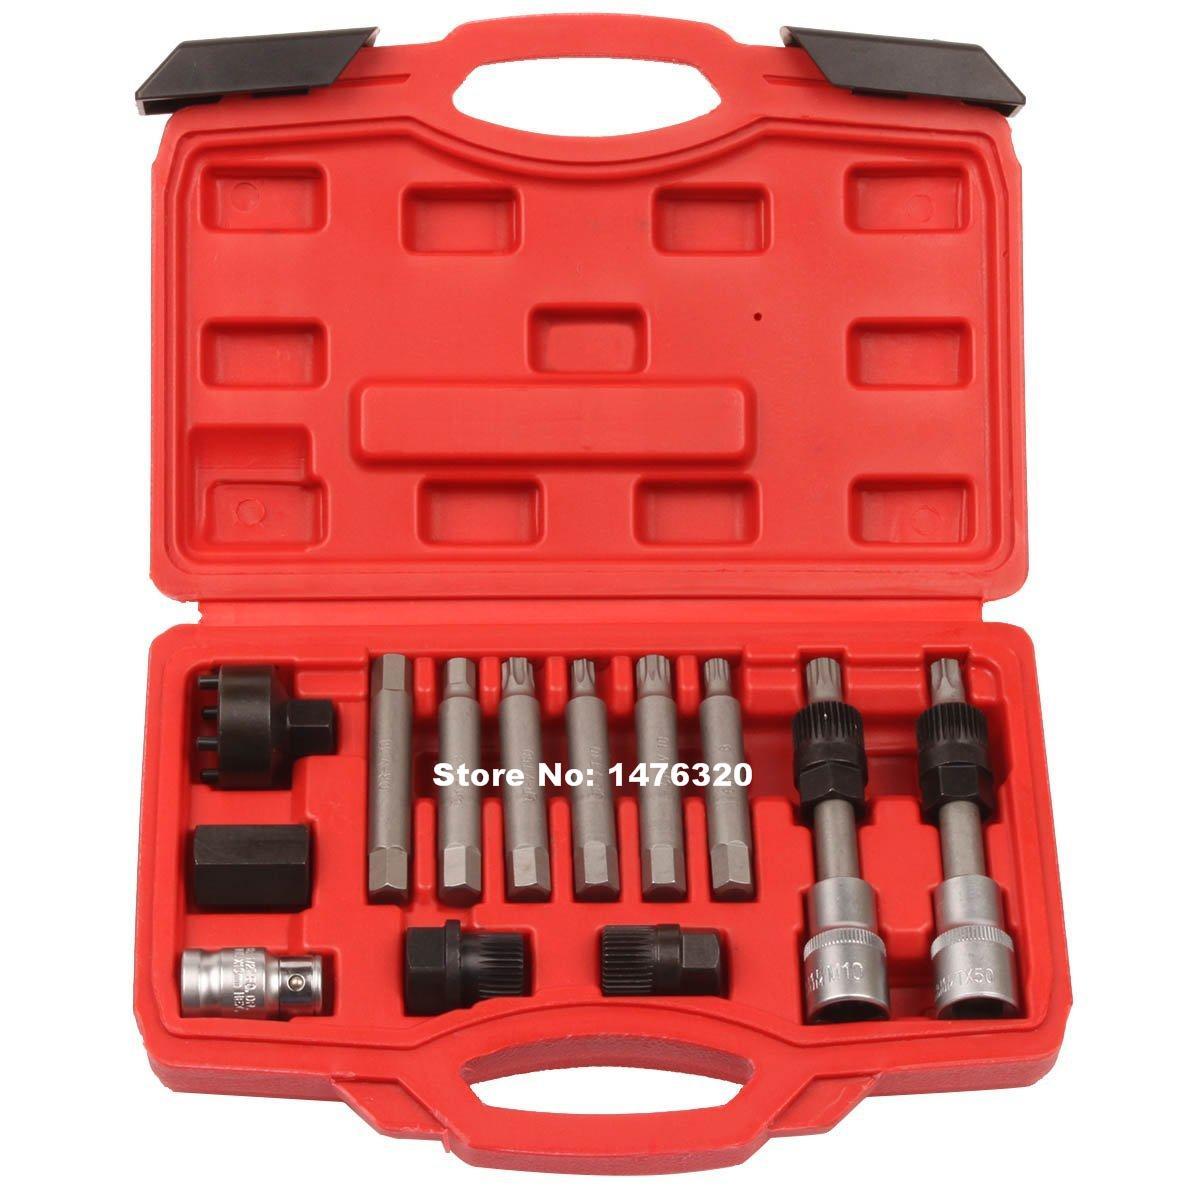 13PCS Automotive Alternator Pulley Flywheel Removal font b Tool b font Kit AT2043